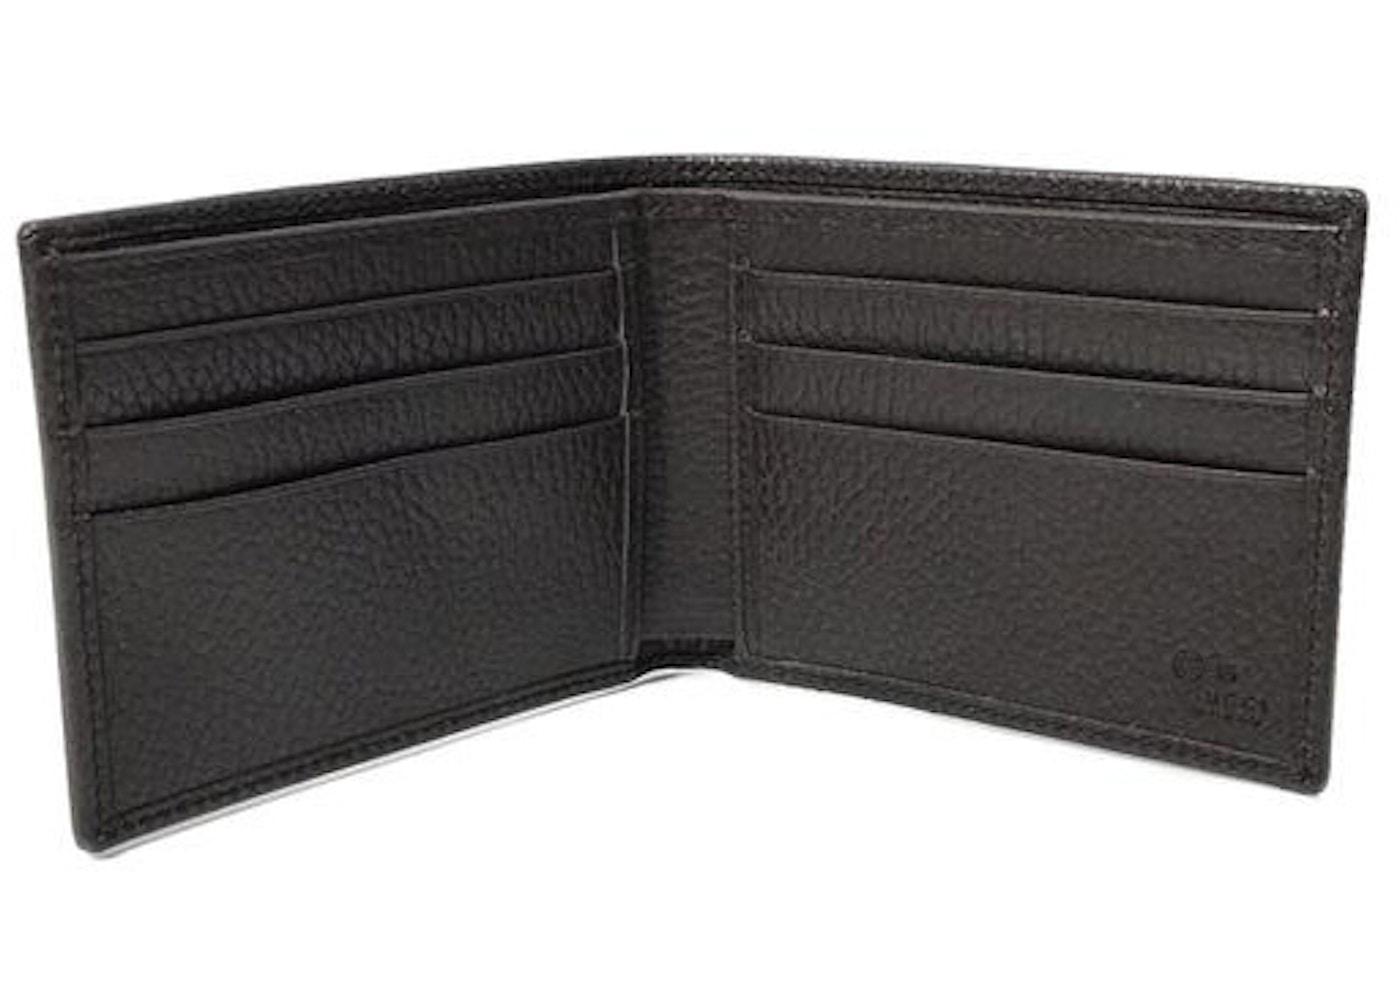 b1965b329791 Buy & Sell Luxury Handbags - New Lowest Asks